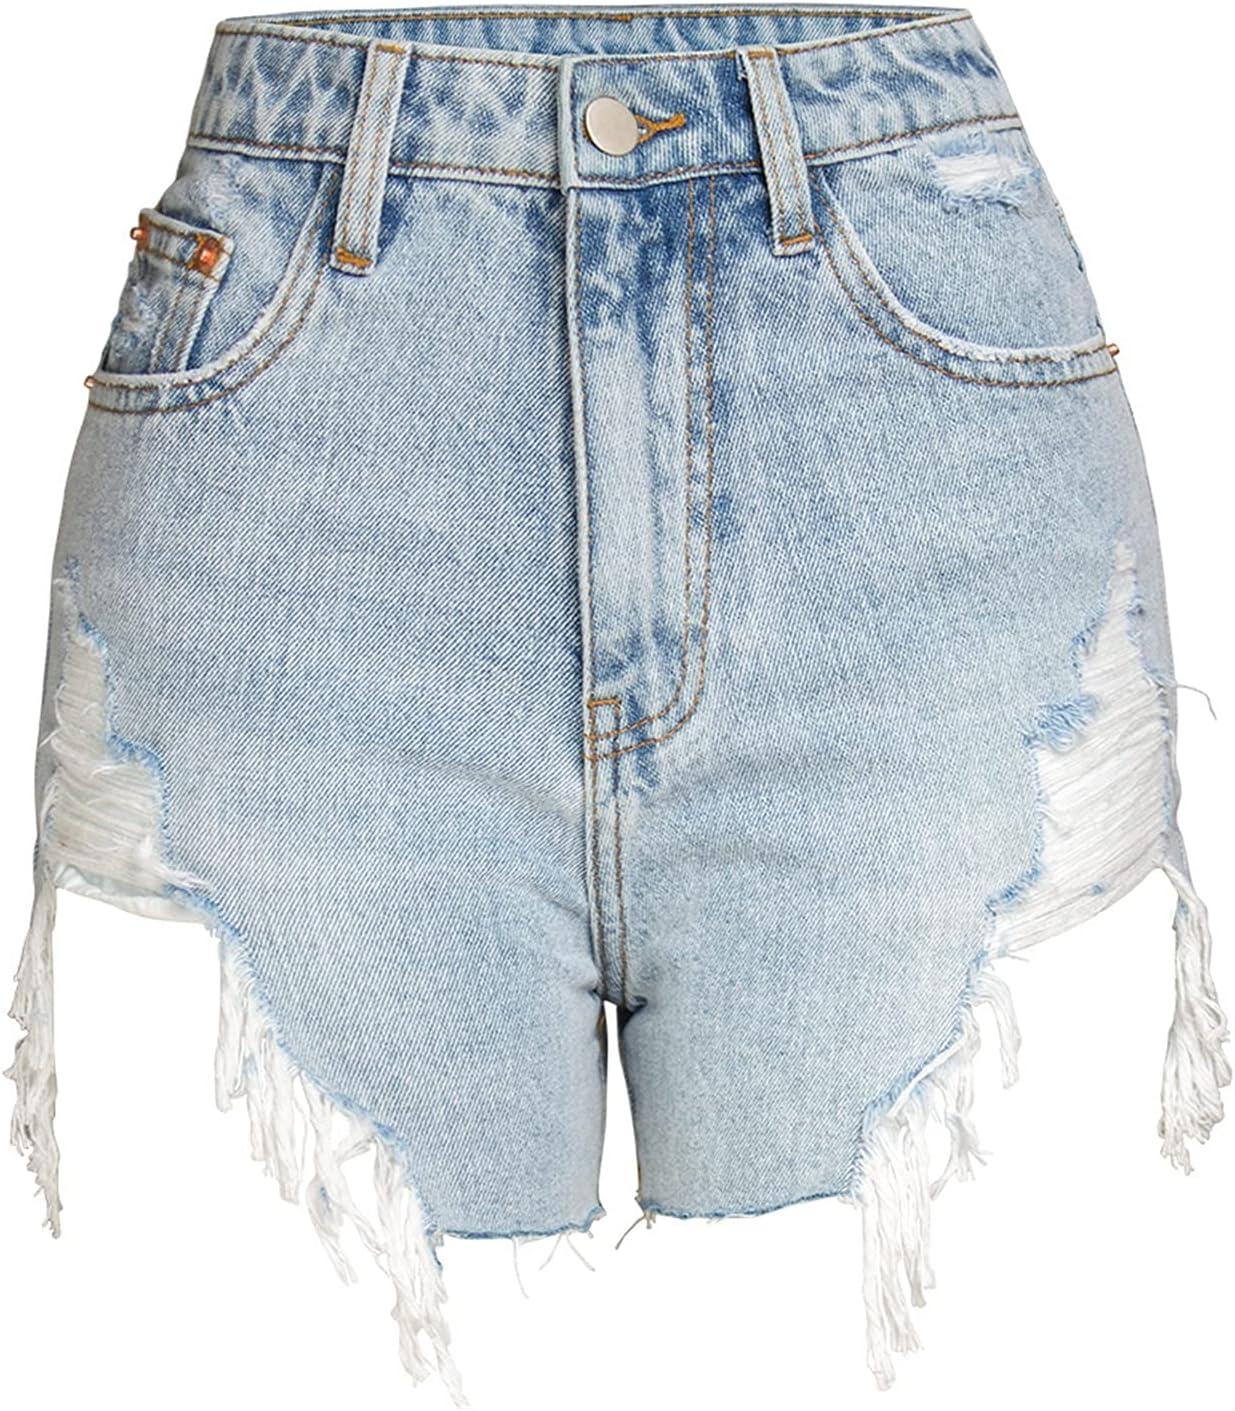 SBCDY Women's Destroyed Ripped Hole Denim Shorts Sexy Short Jeans Summer High Waist Denim Shorts Hole Tear Tassel Denim Shorts (Color : Blue, Size : 36)